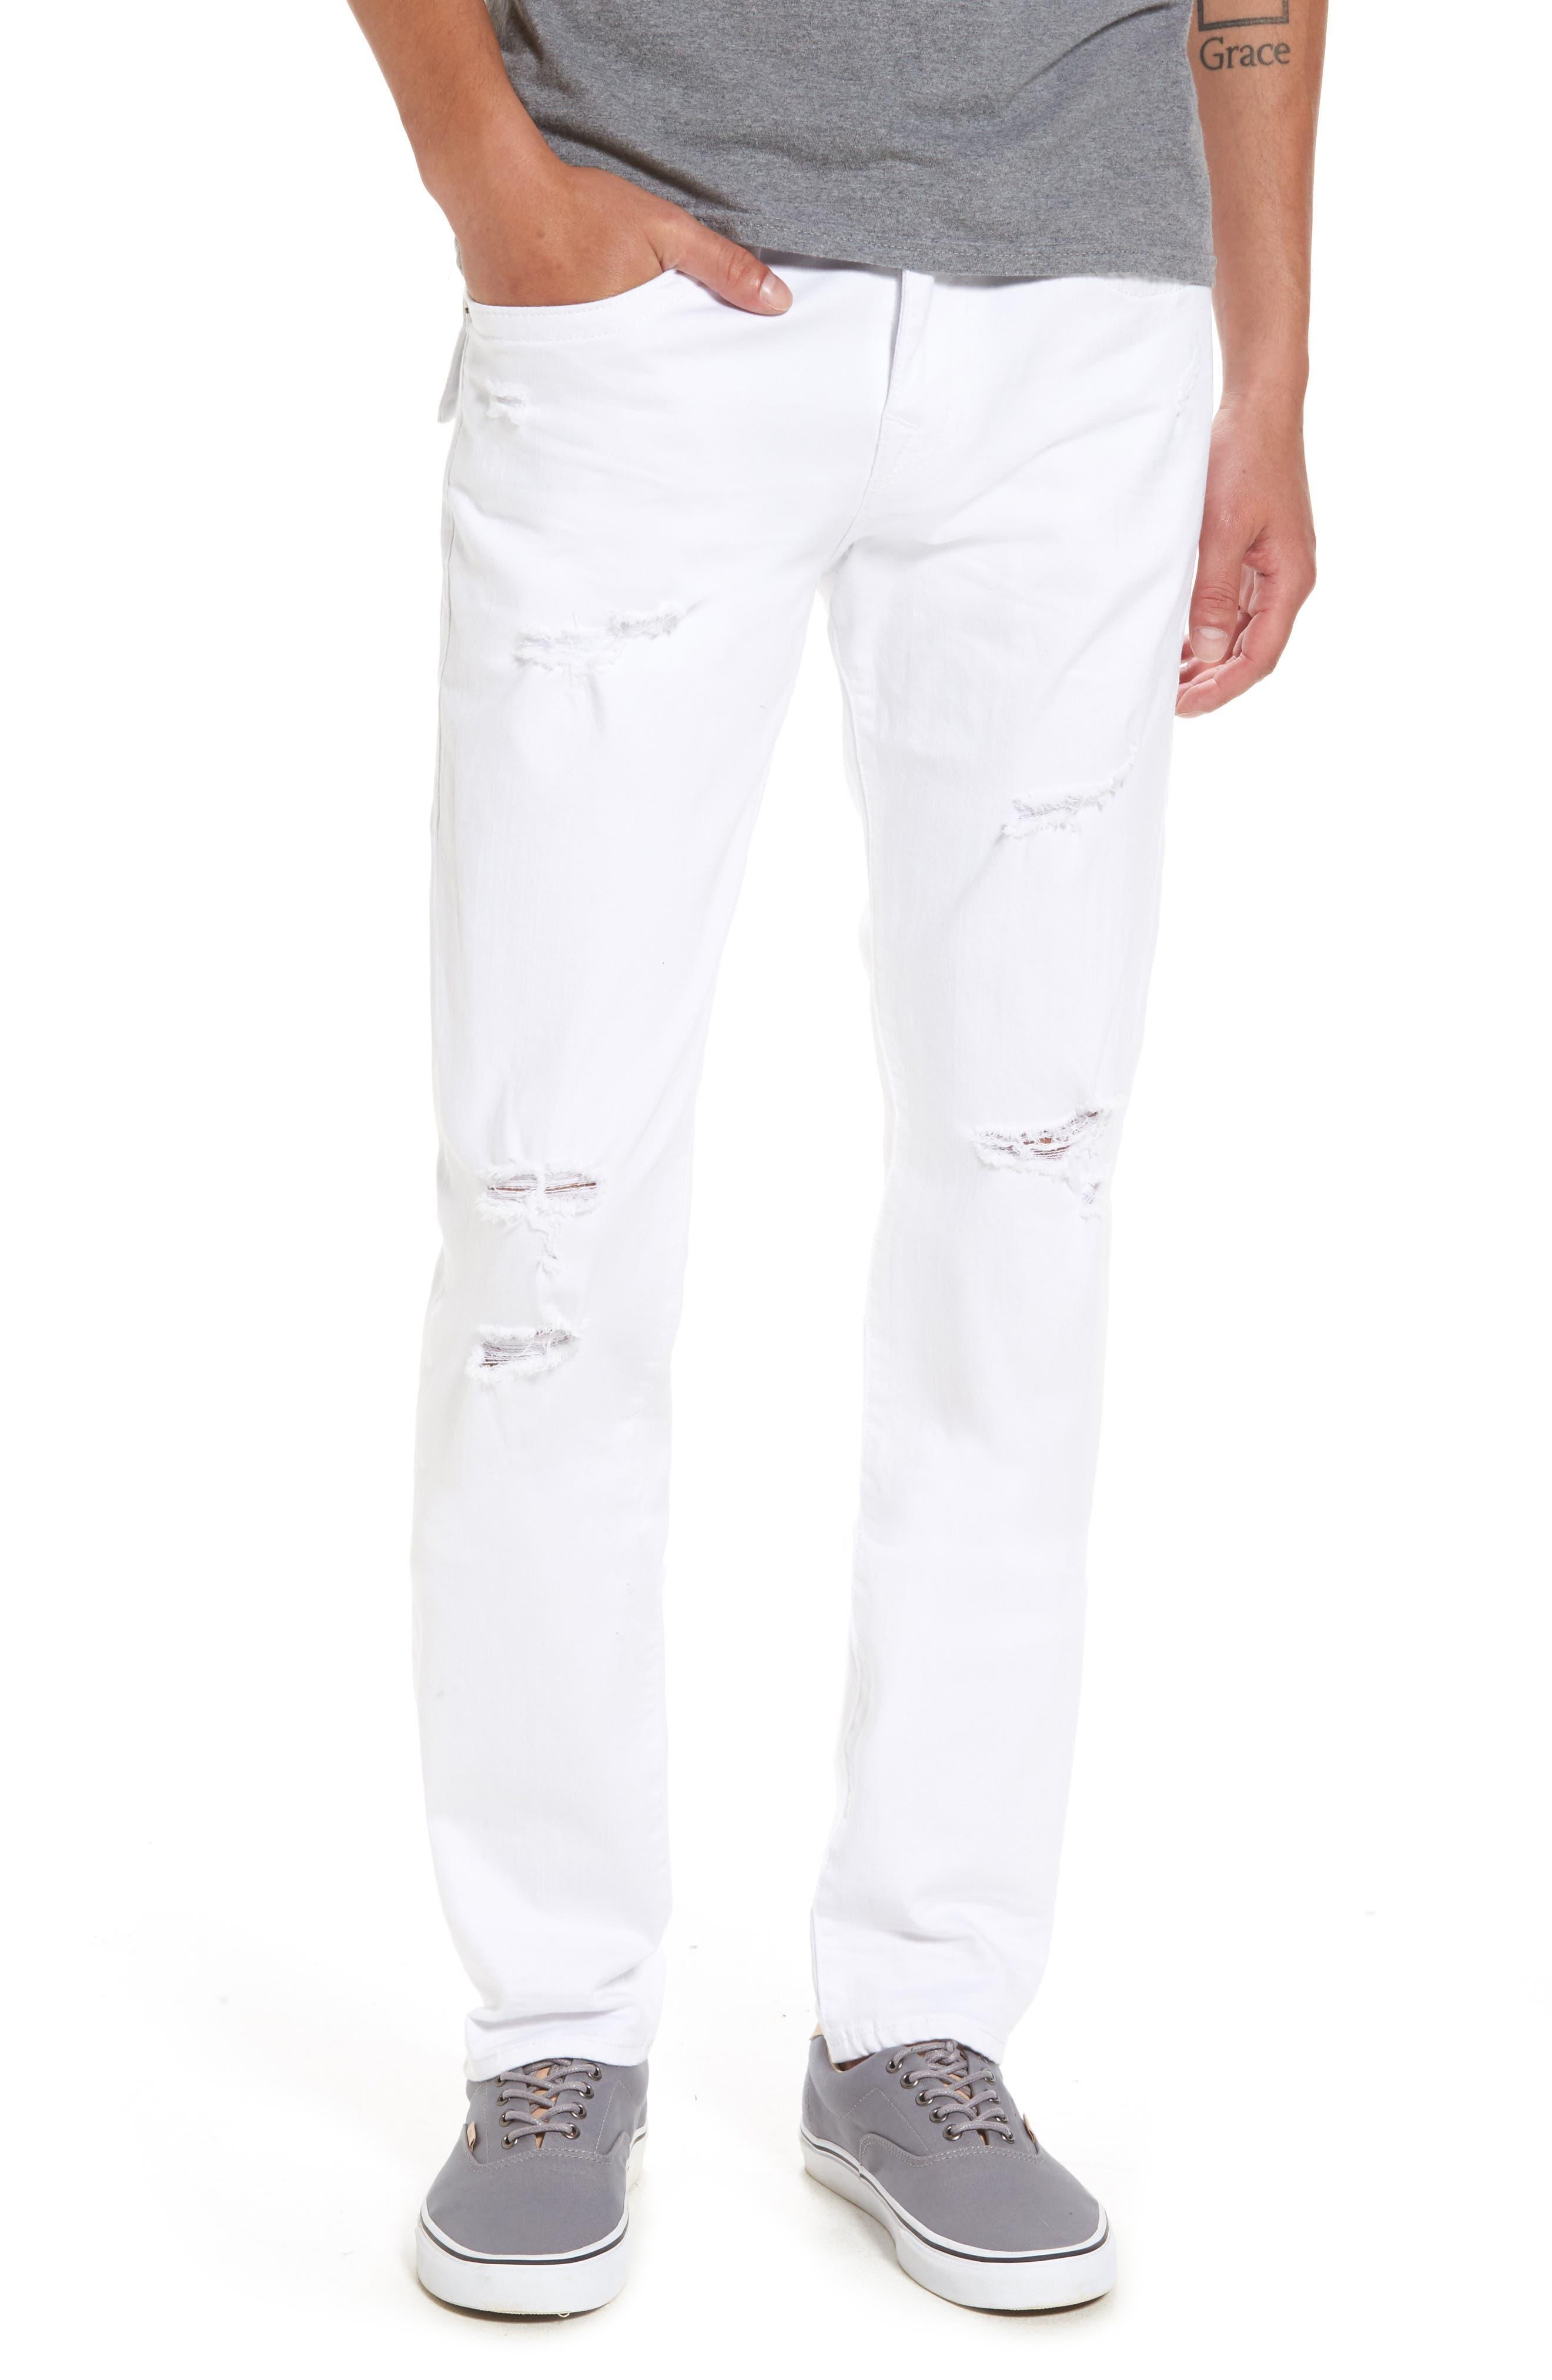 True Religion Brand Jeans Rocco Skinny Fit Jeans (Worn Cruiser)